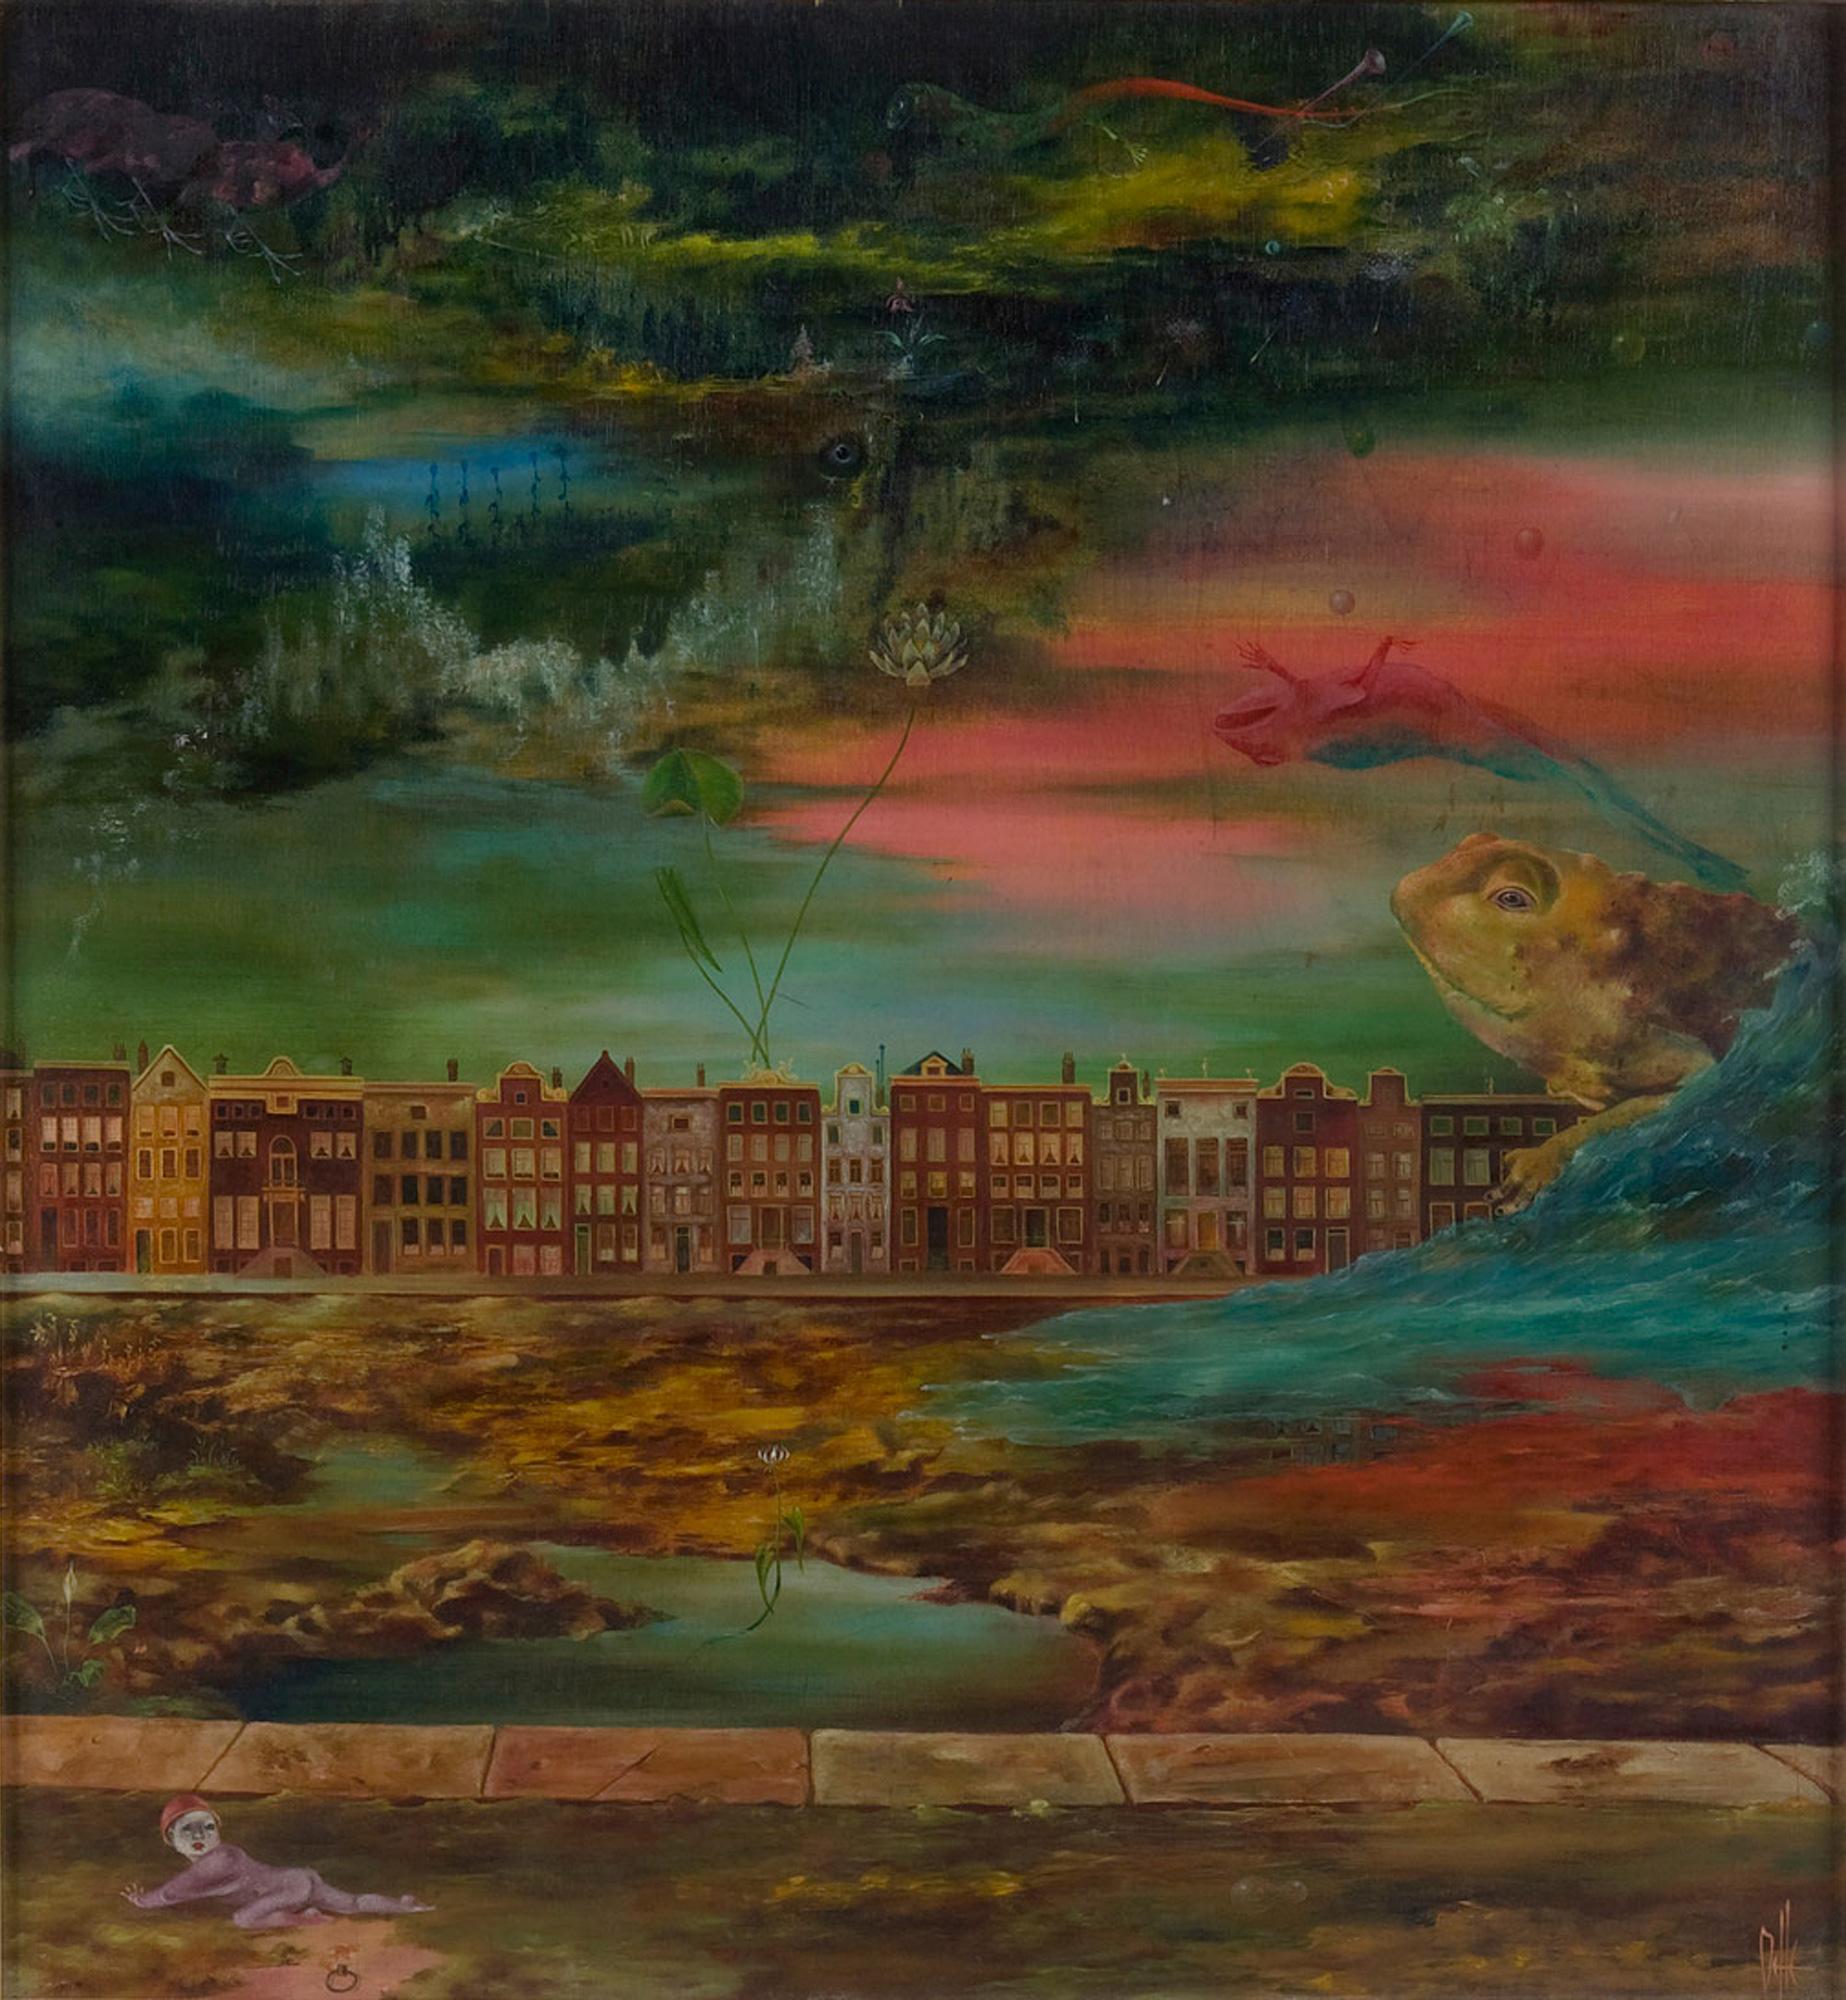 Melle schilder | Amsterdam, olieverf op paneel